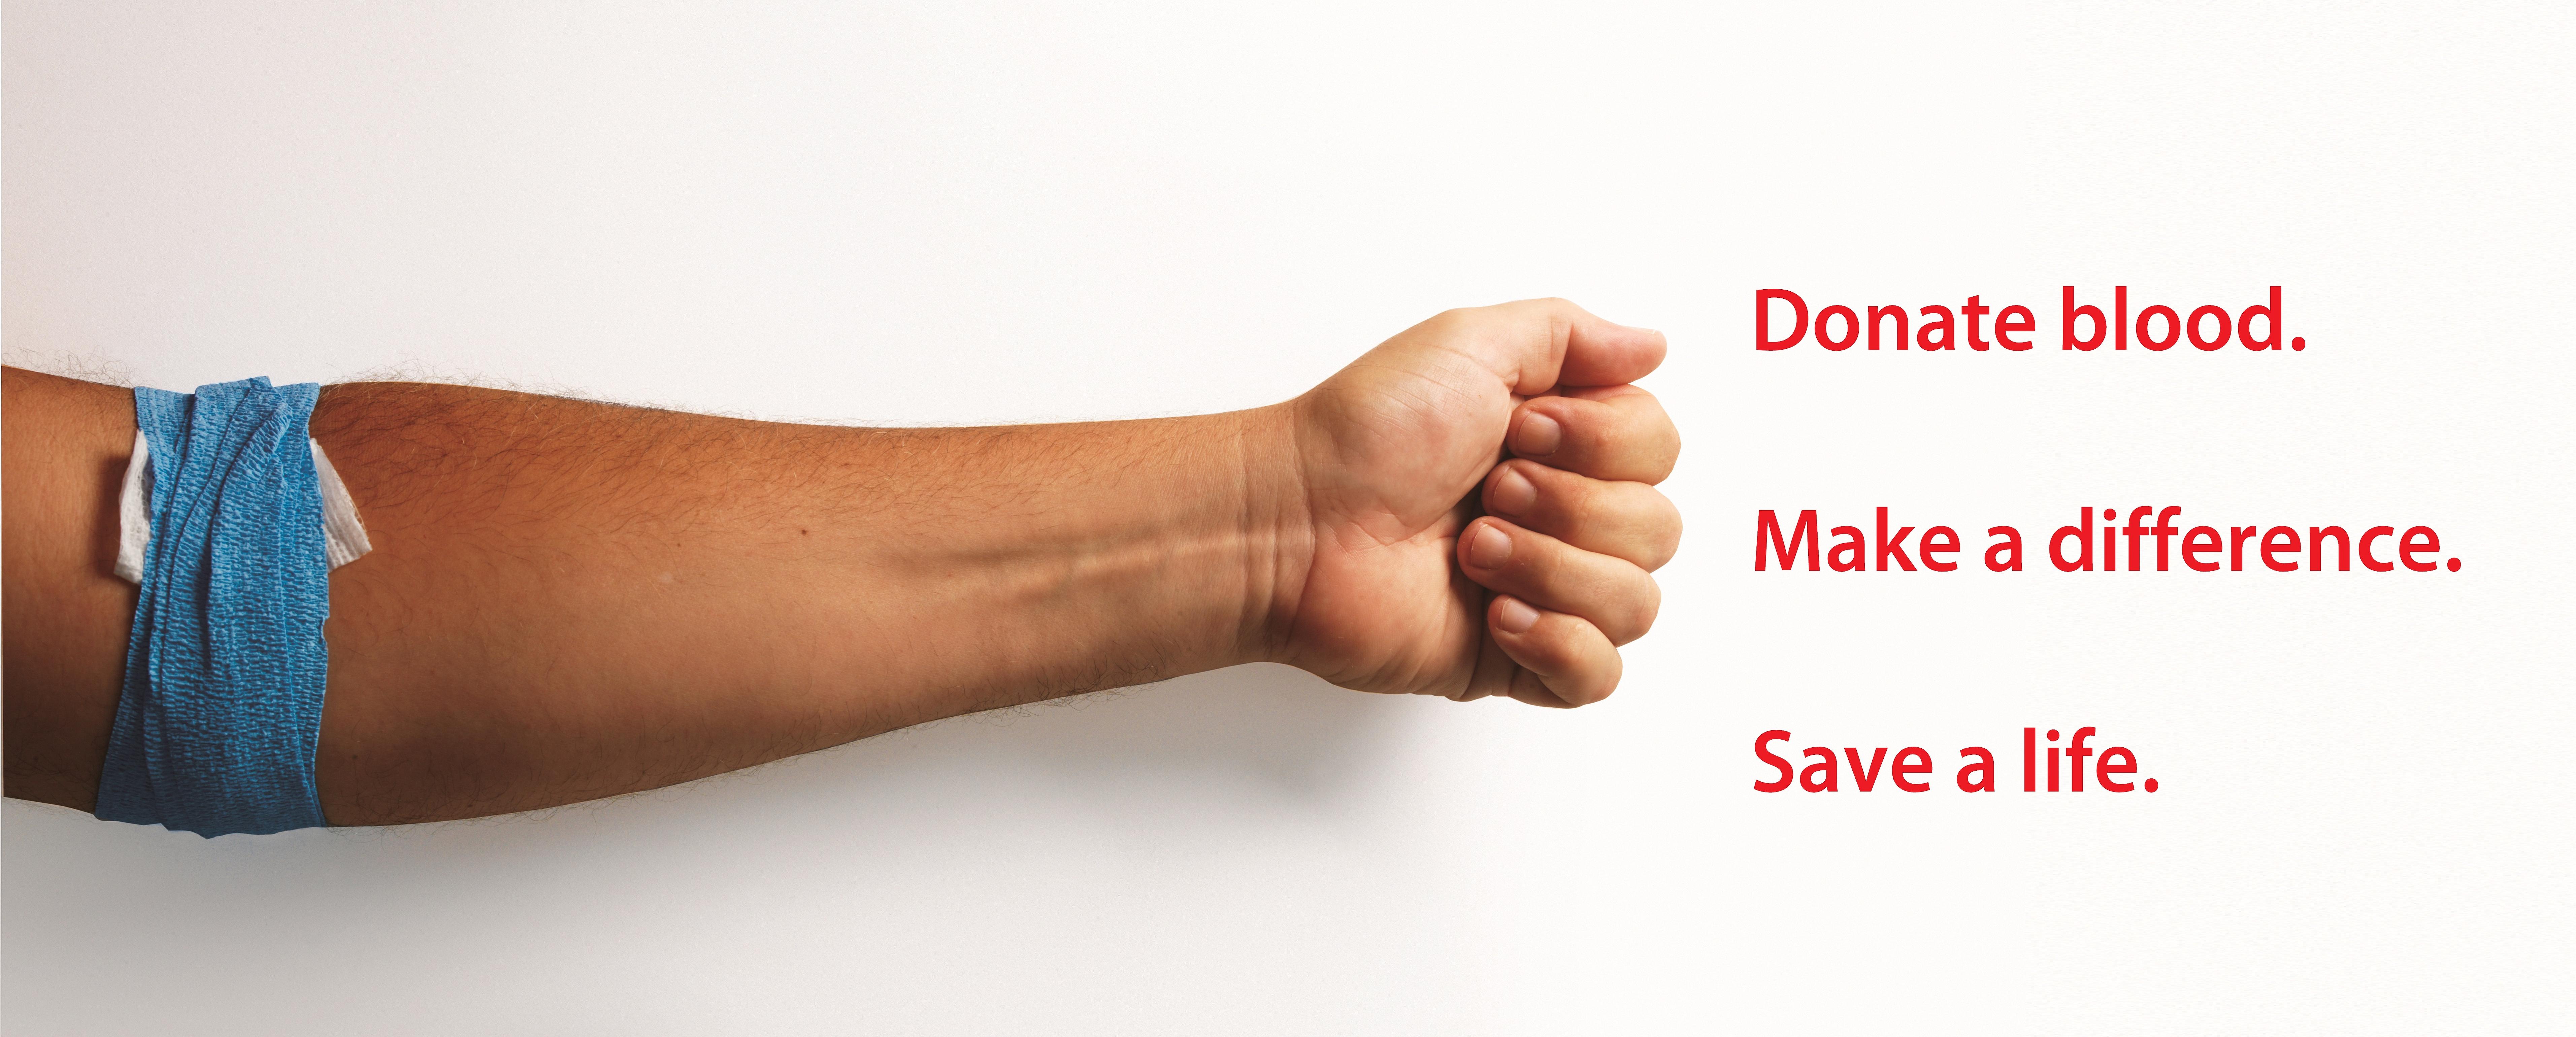 Blood Donation 5k Retina Ultra Fond Décran Hd Arrière Plan